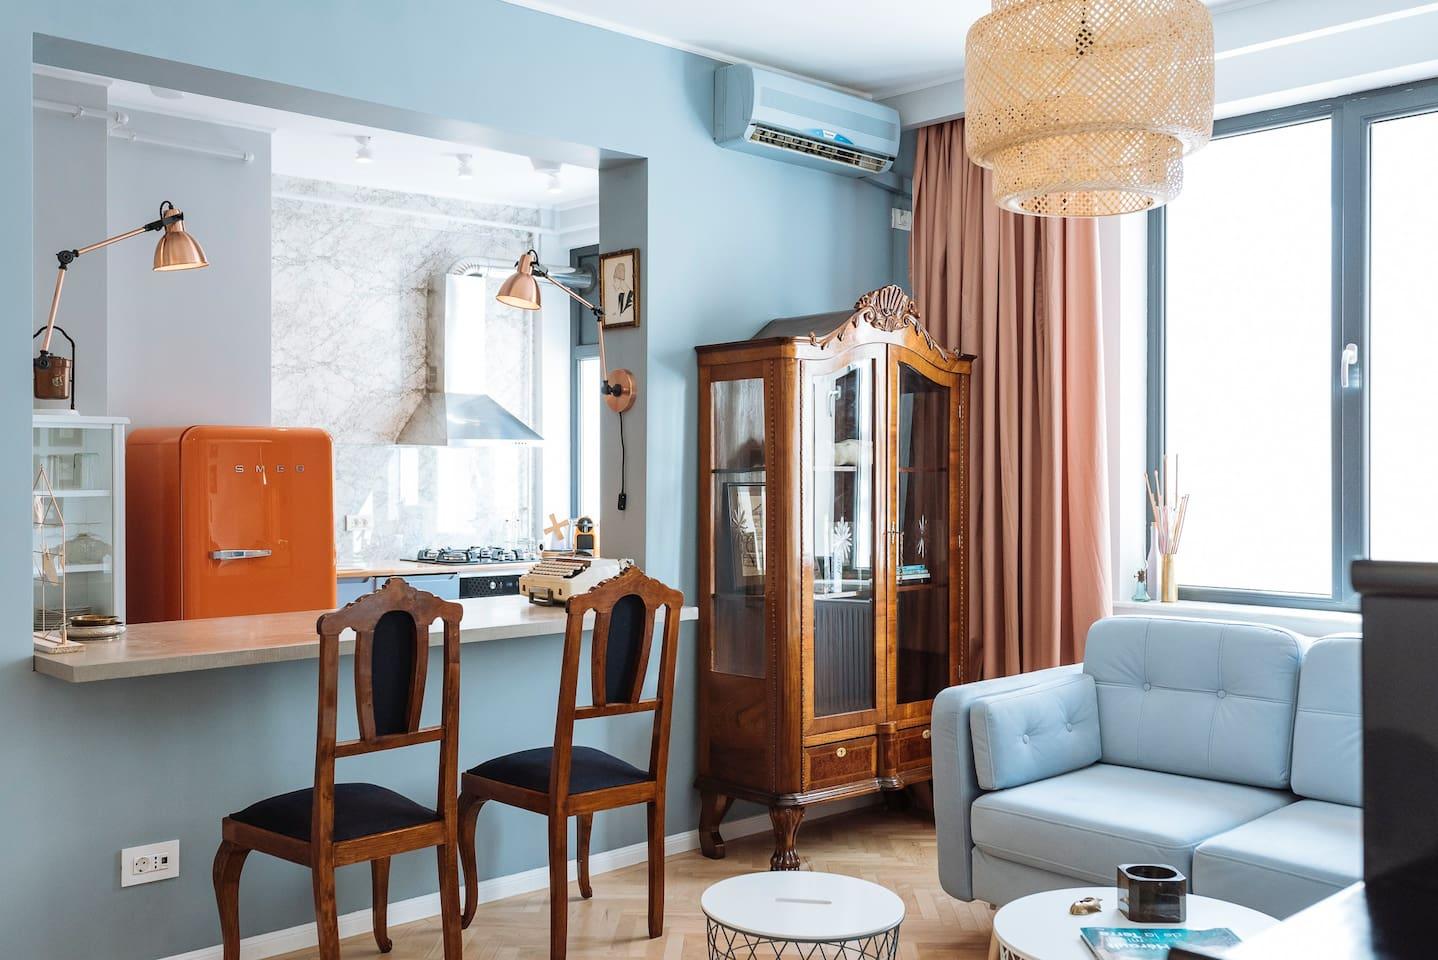 Exquisite Old Town Modern Retro Apartment